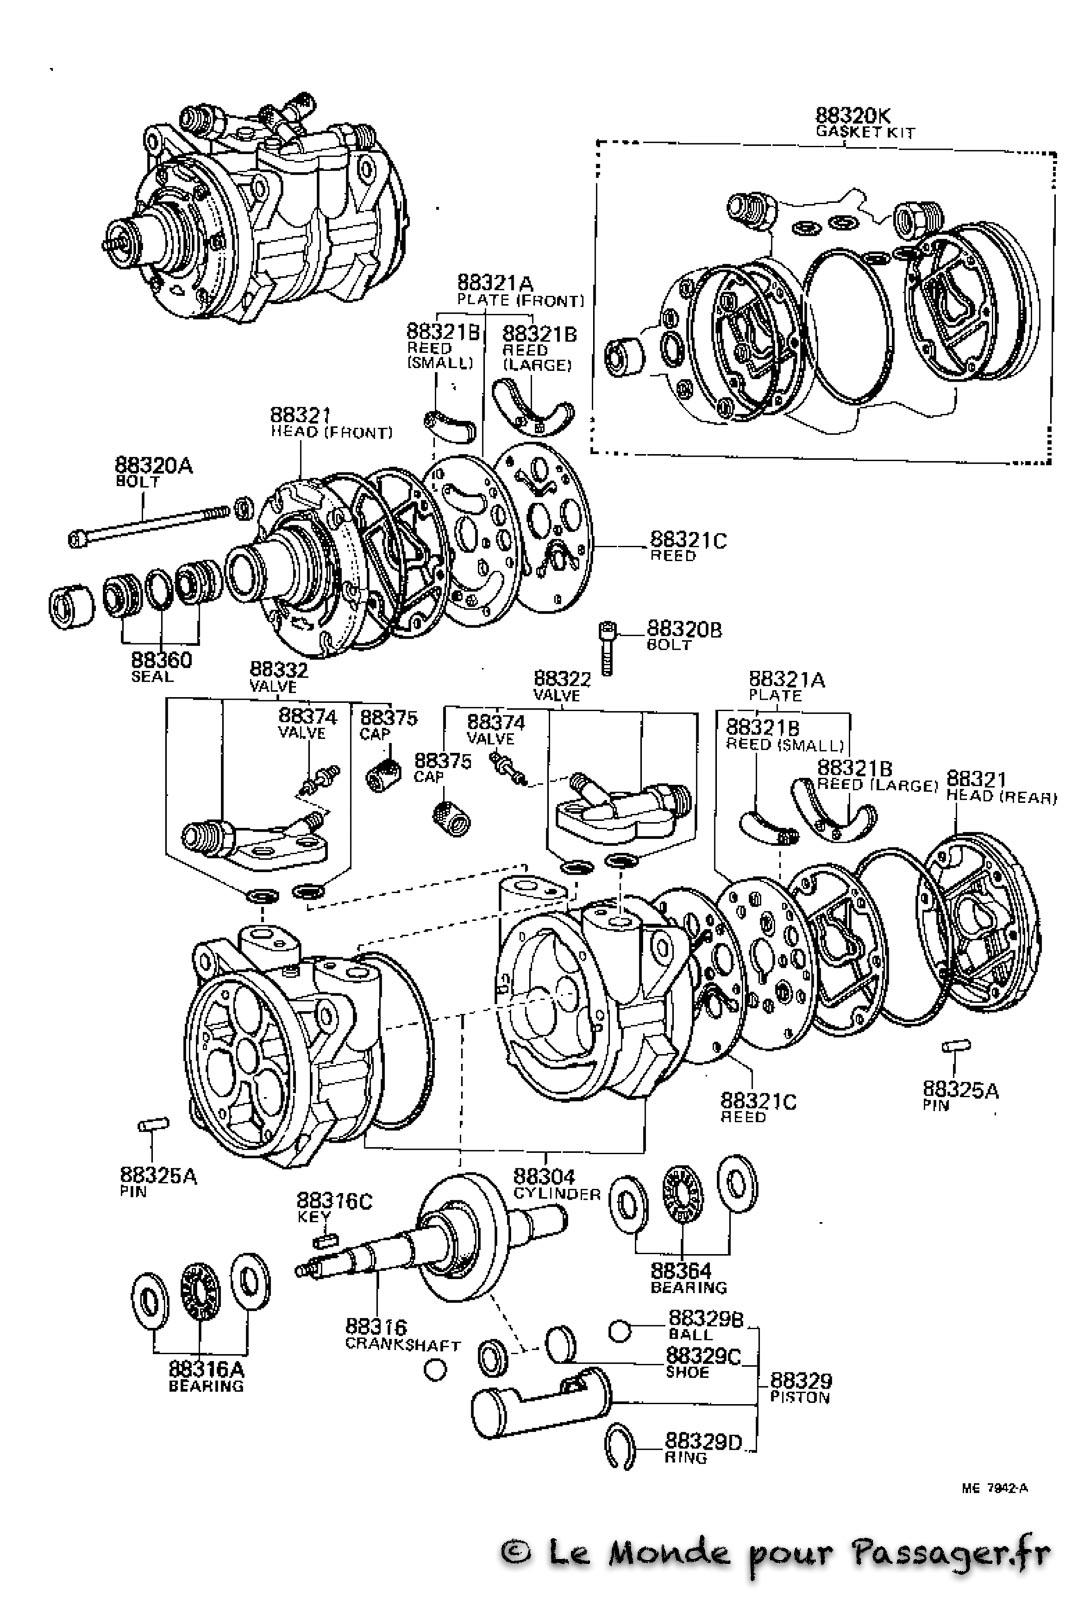 Fj55-Eclatés-Techniques141